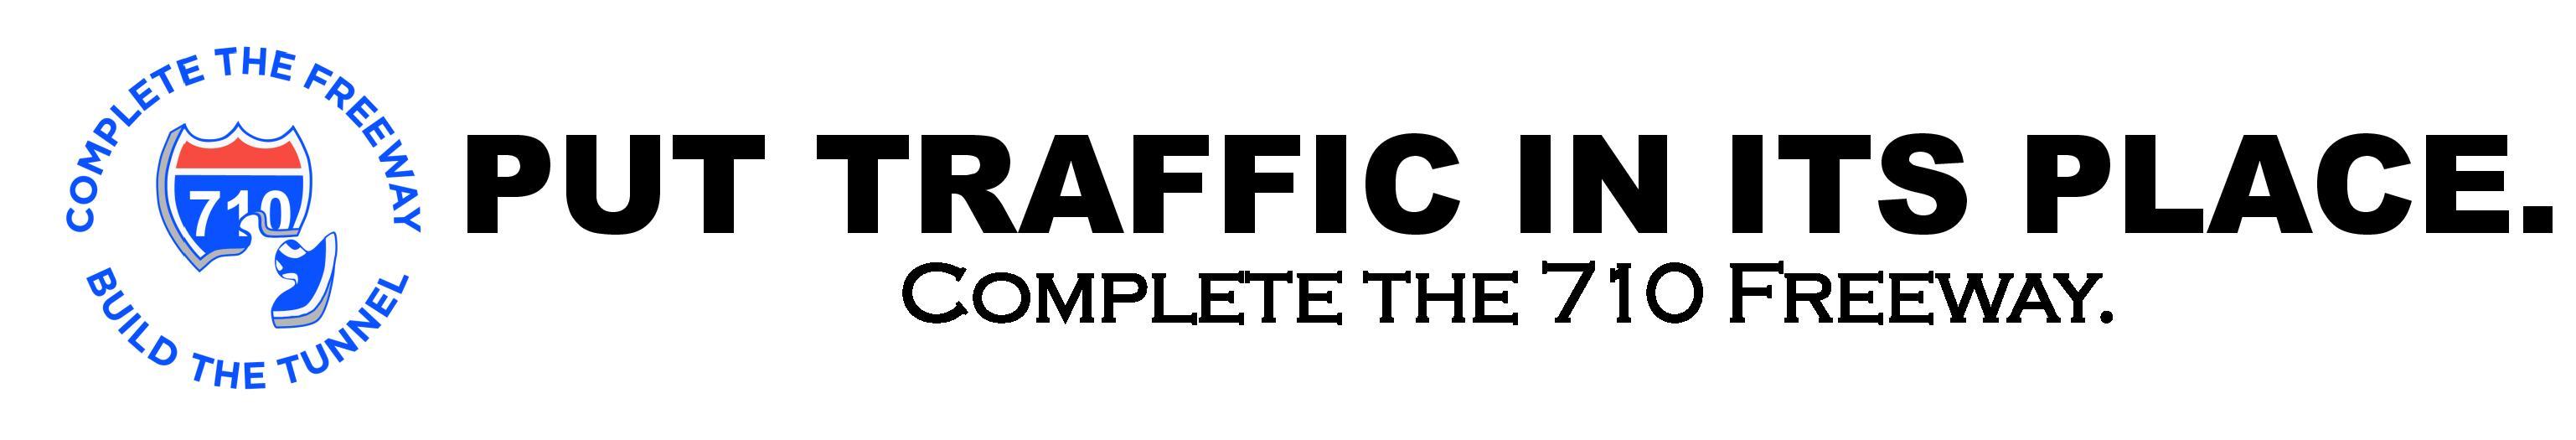 put traffic banner